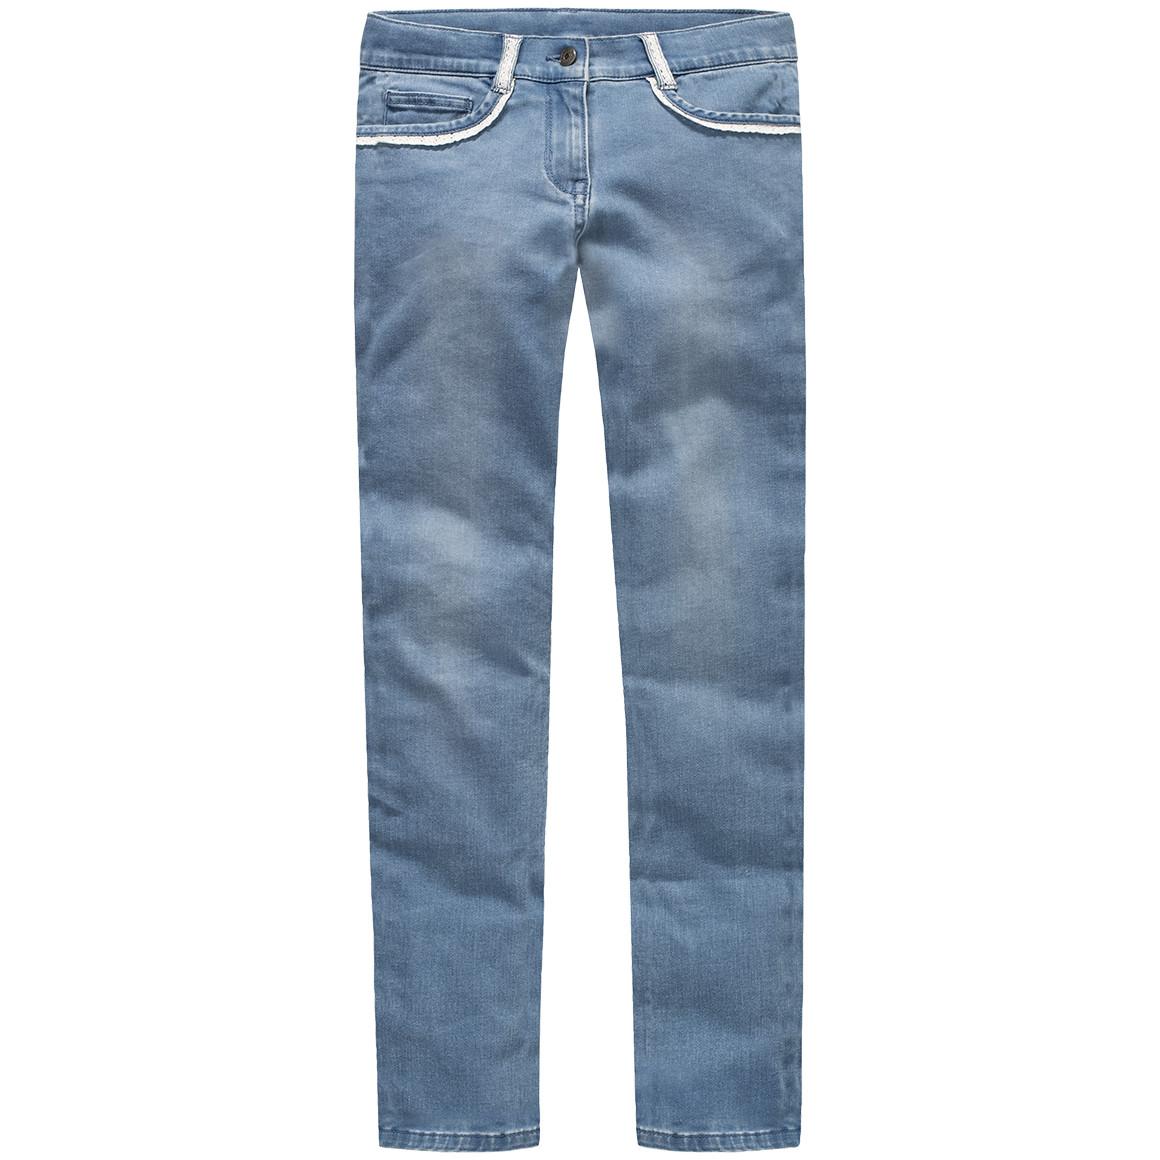 Mädchen Exxtra Size Skinny Jeans mit Spitze